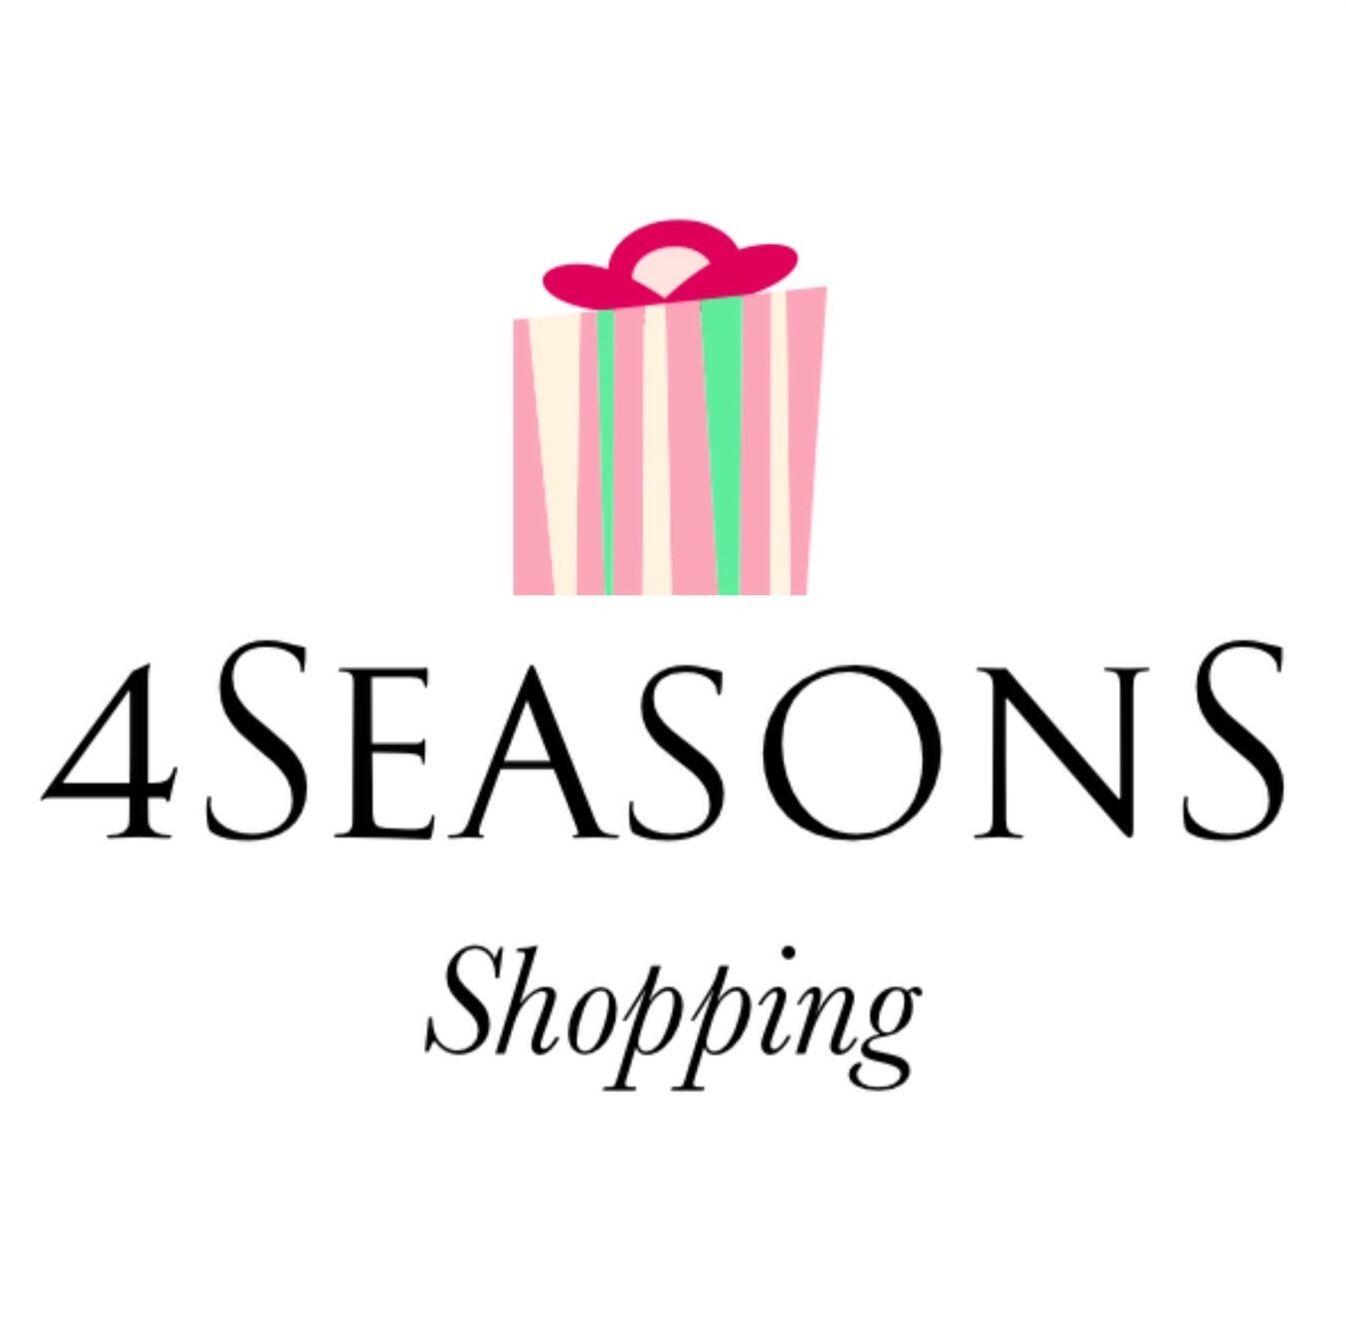 4seasons_shopping